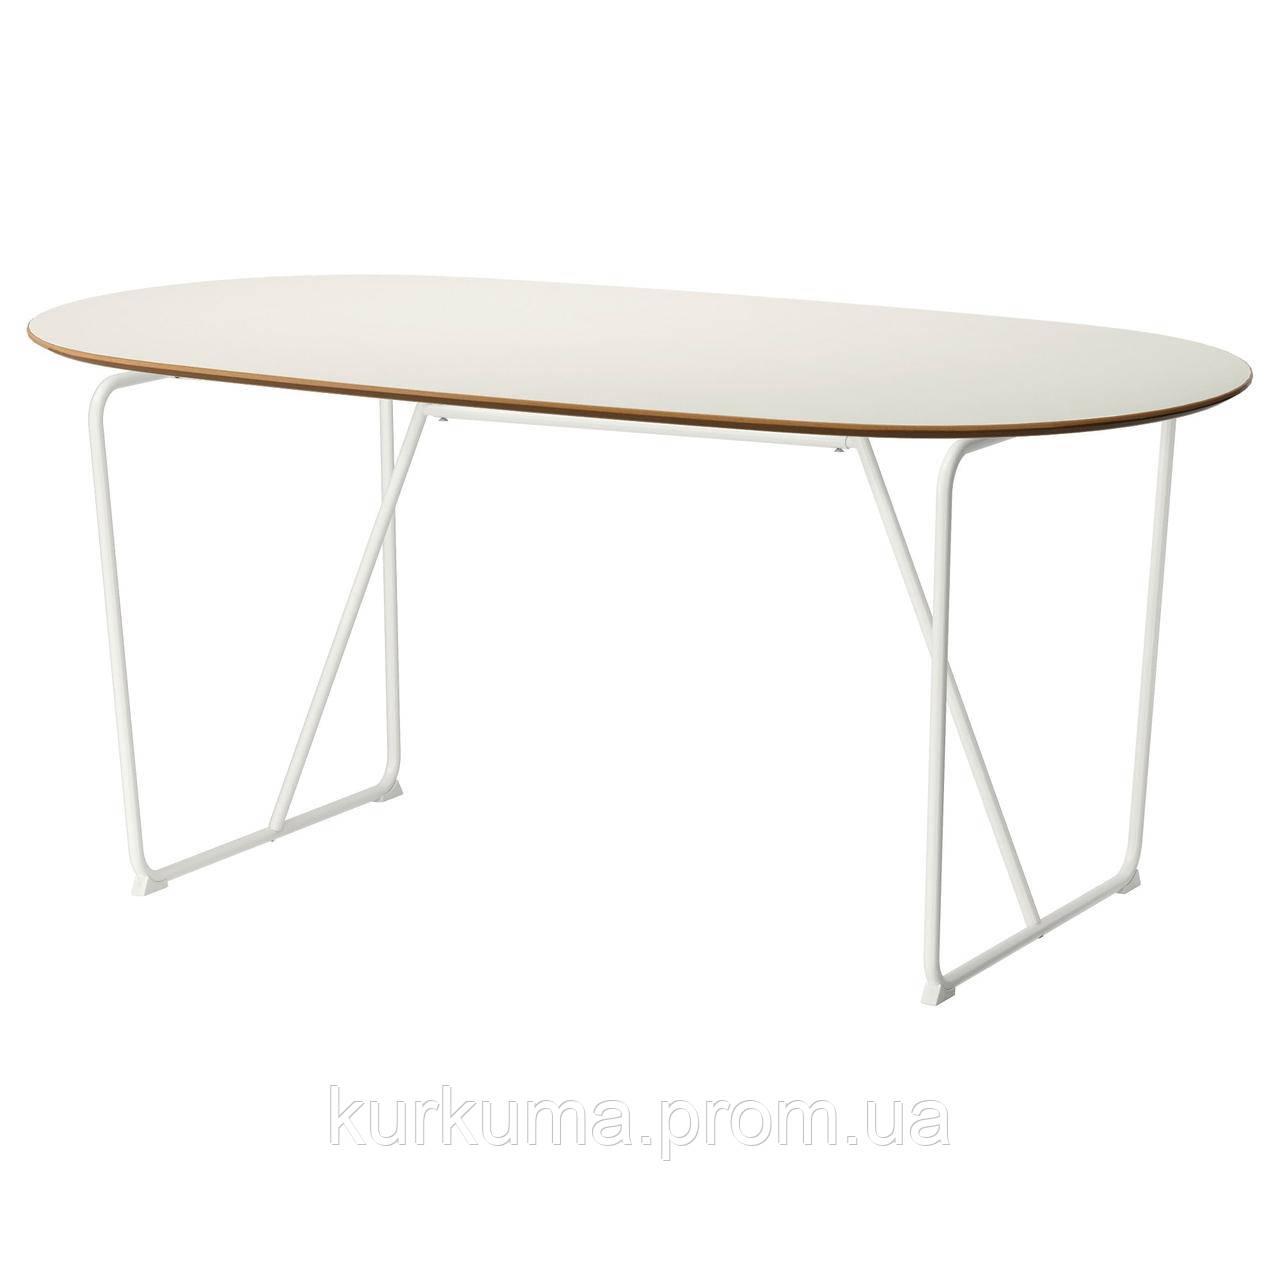 IKEA SLAHULT Стол, белый, бэккарид белый  (791.406.96)